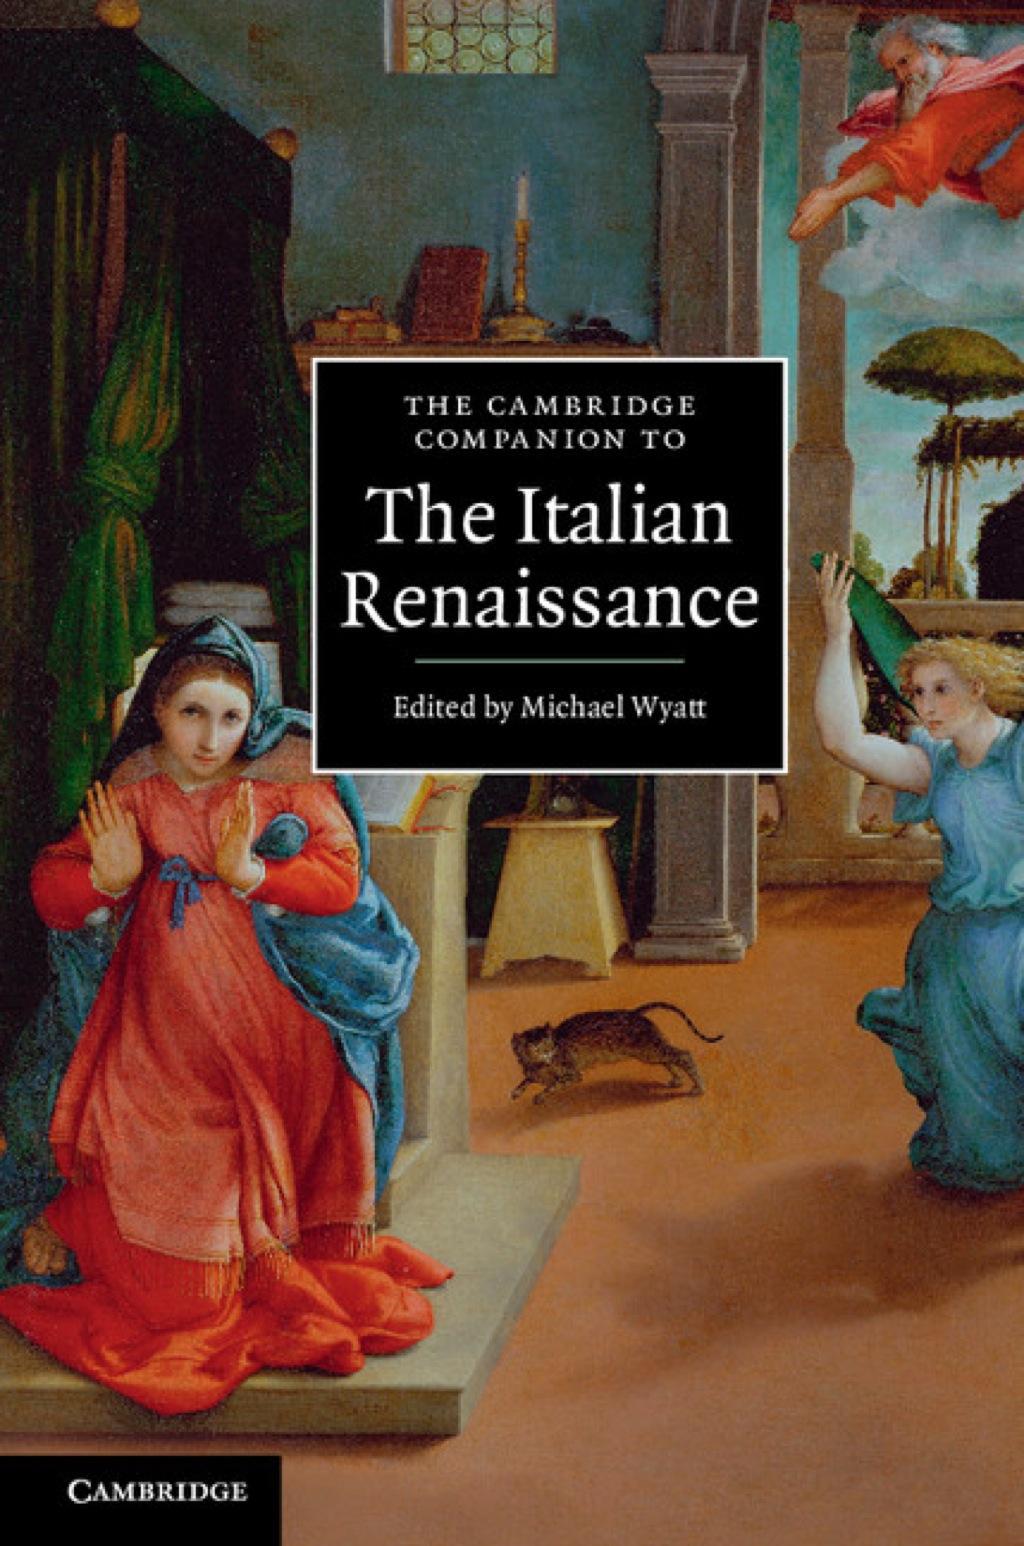 The Cambridge Companion To The Italian Renaissance (ebook)